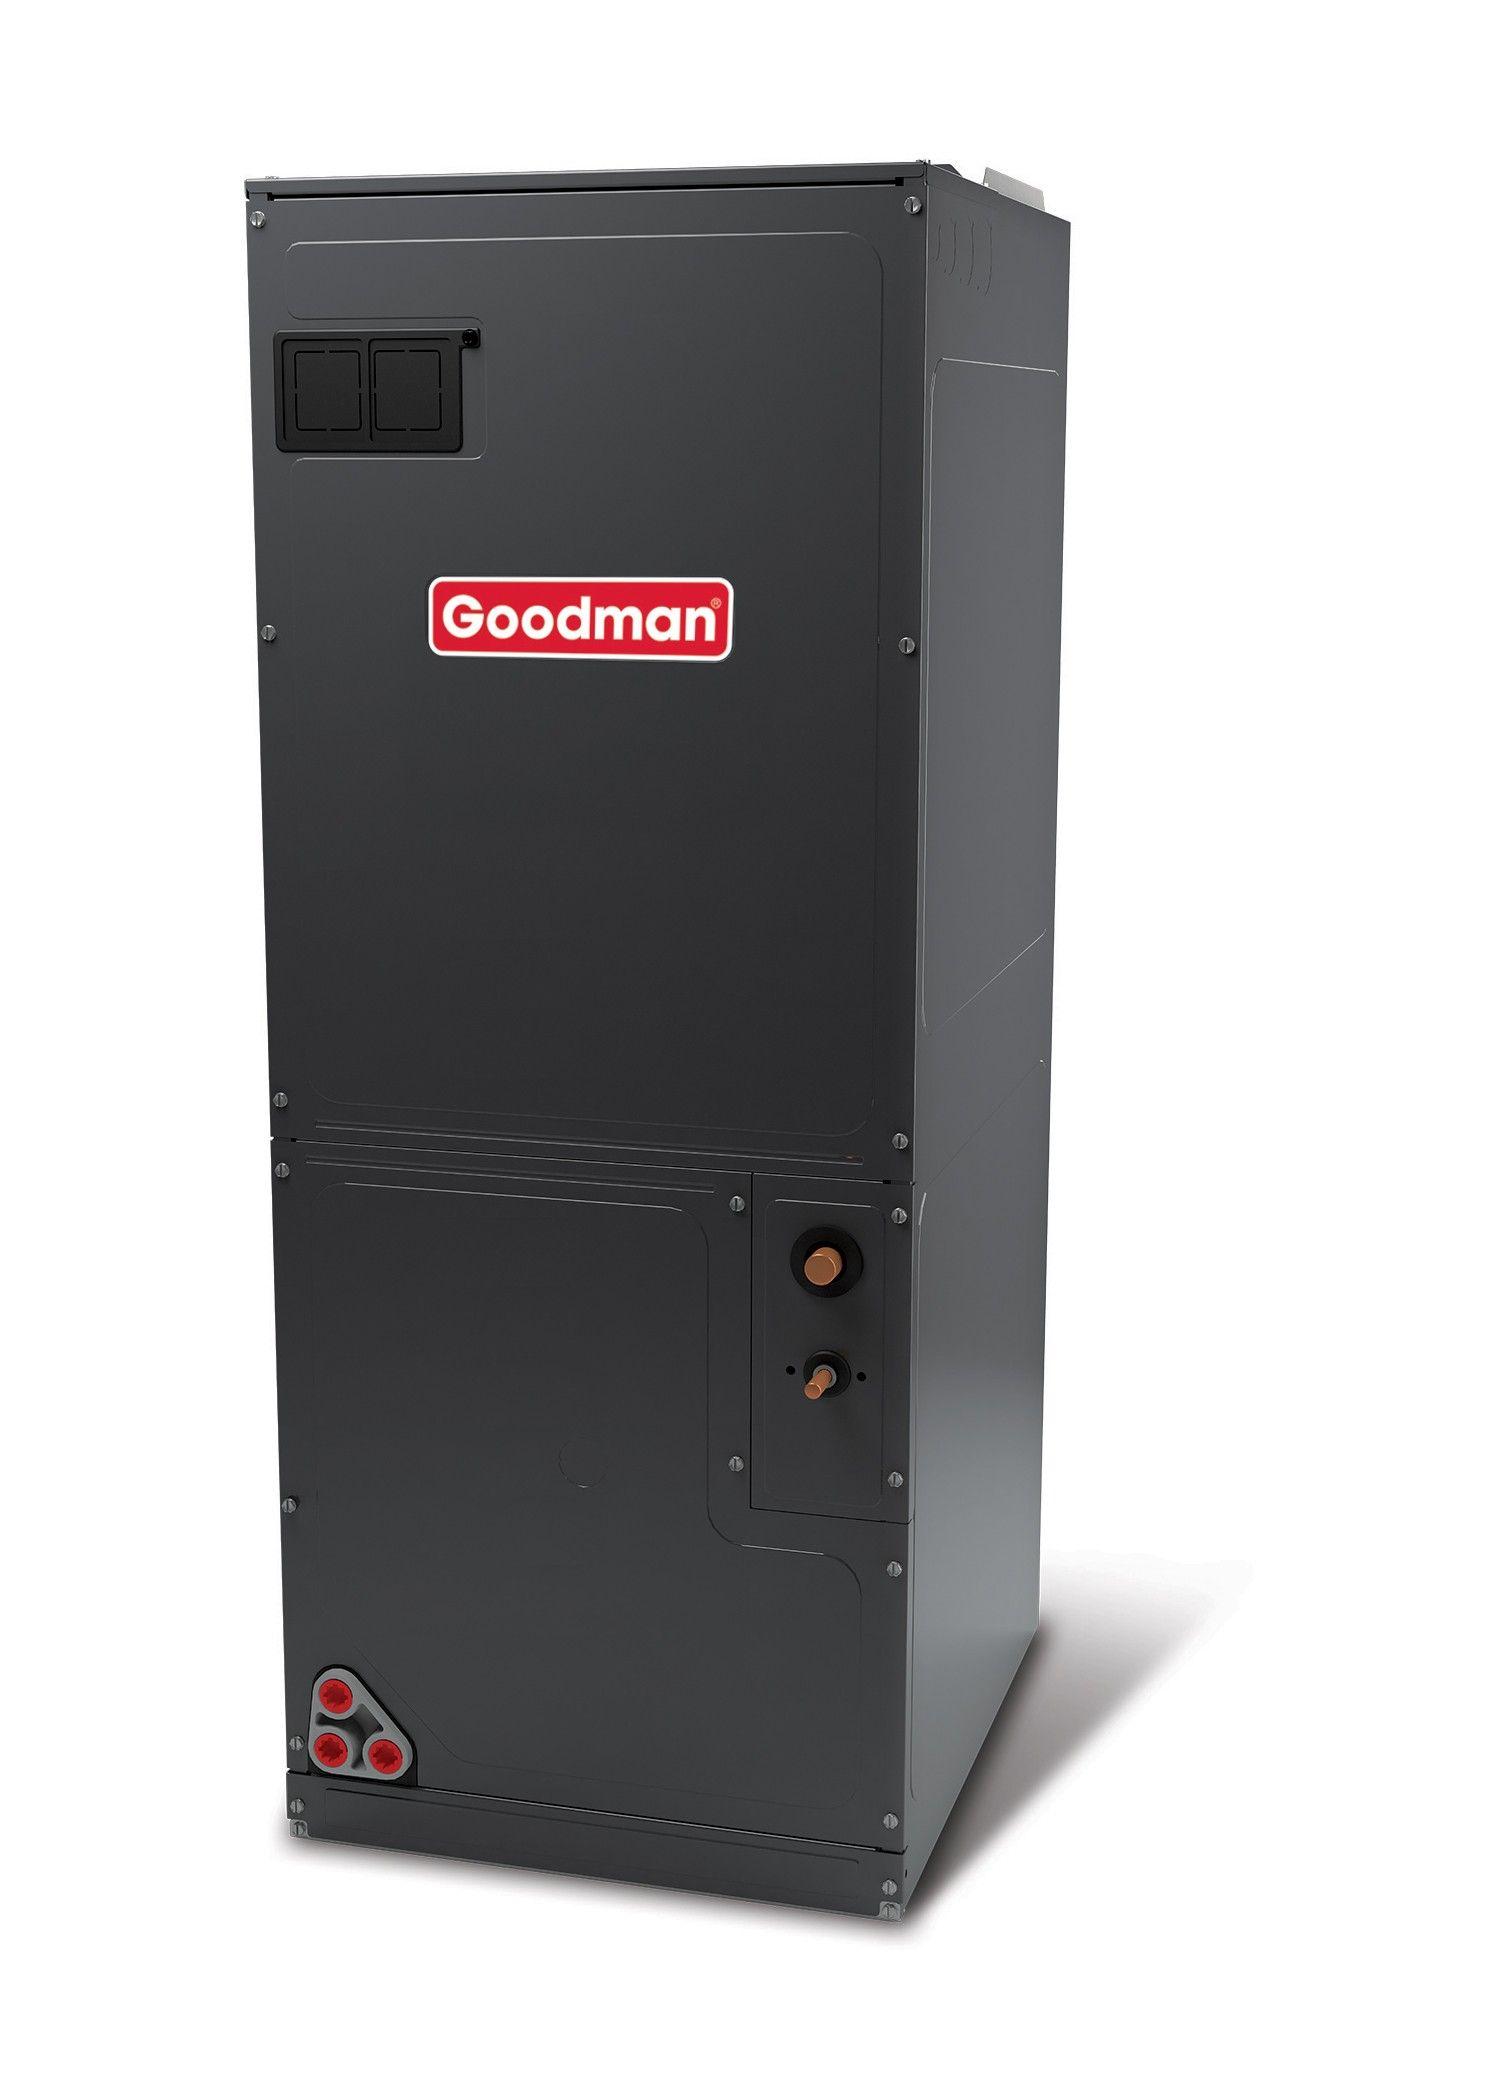 Goodman 3.0 Ton ASPT High-Efficiency Multiposition Air Handler